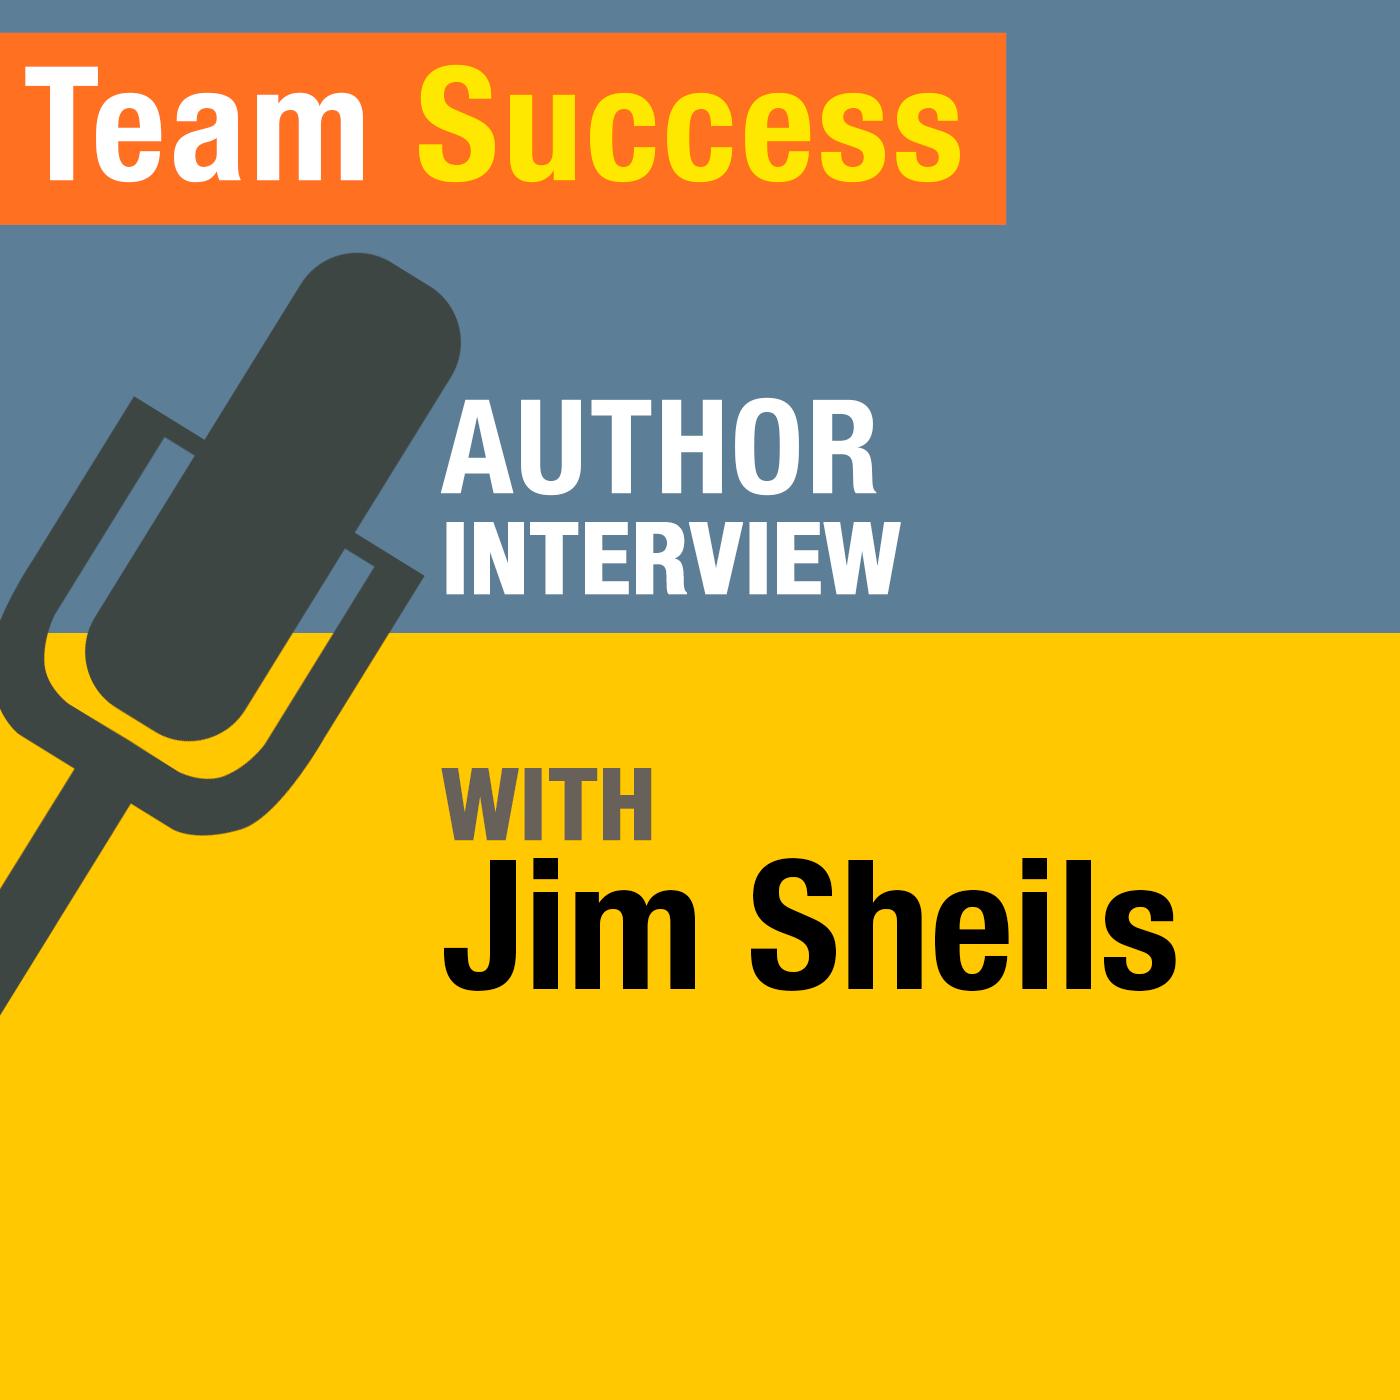 An Interview With Jim Sheils